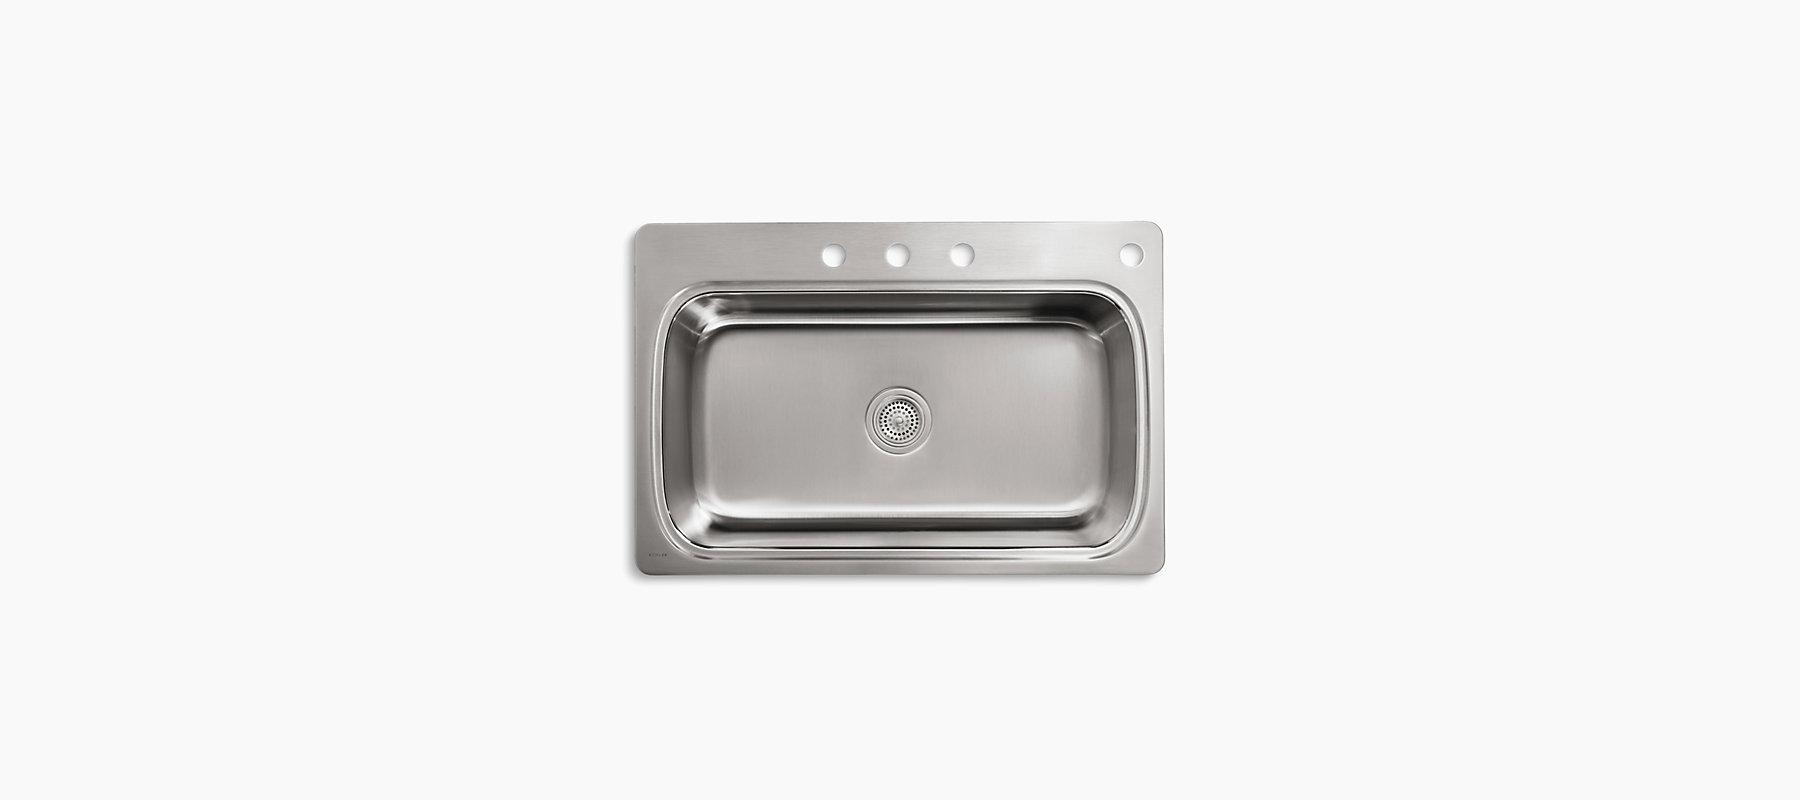 K-3373-4 | Verse Top-Mount Kitchen Sink, Four Faucet Holes | KOHLER